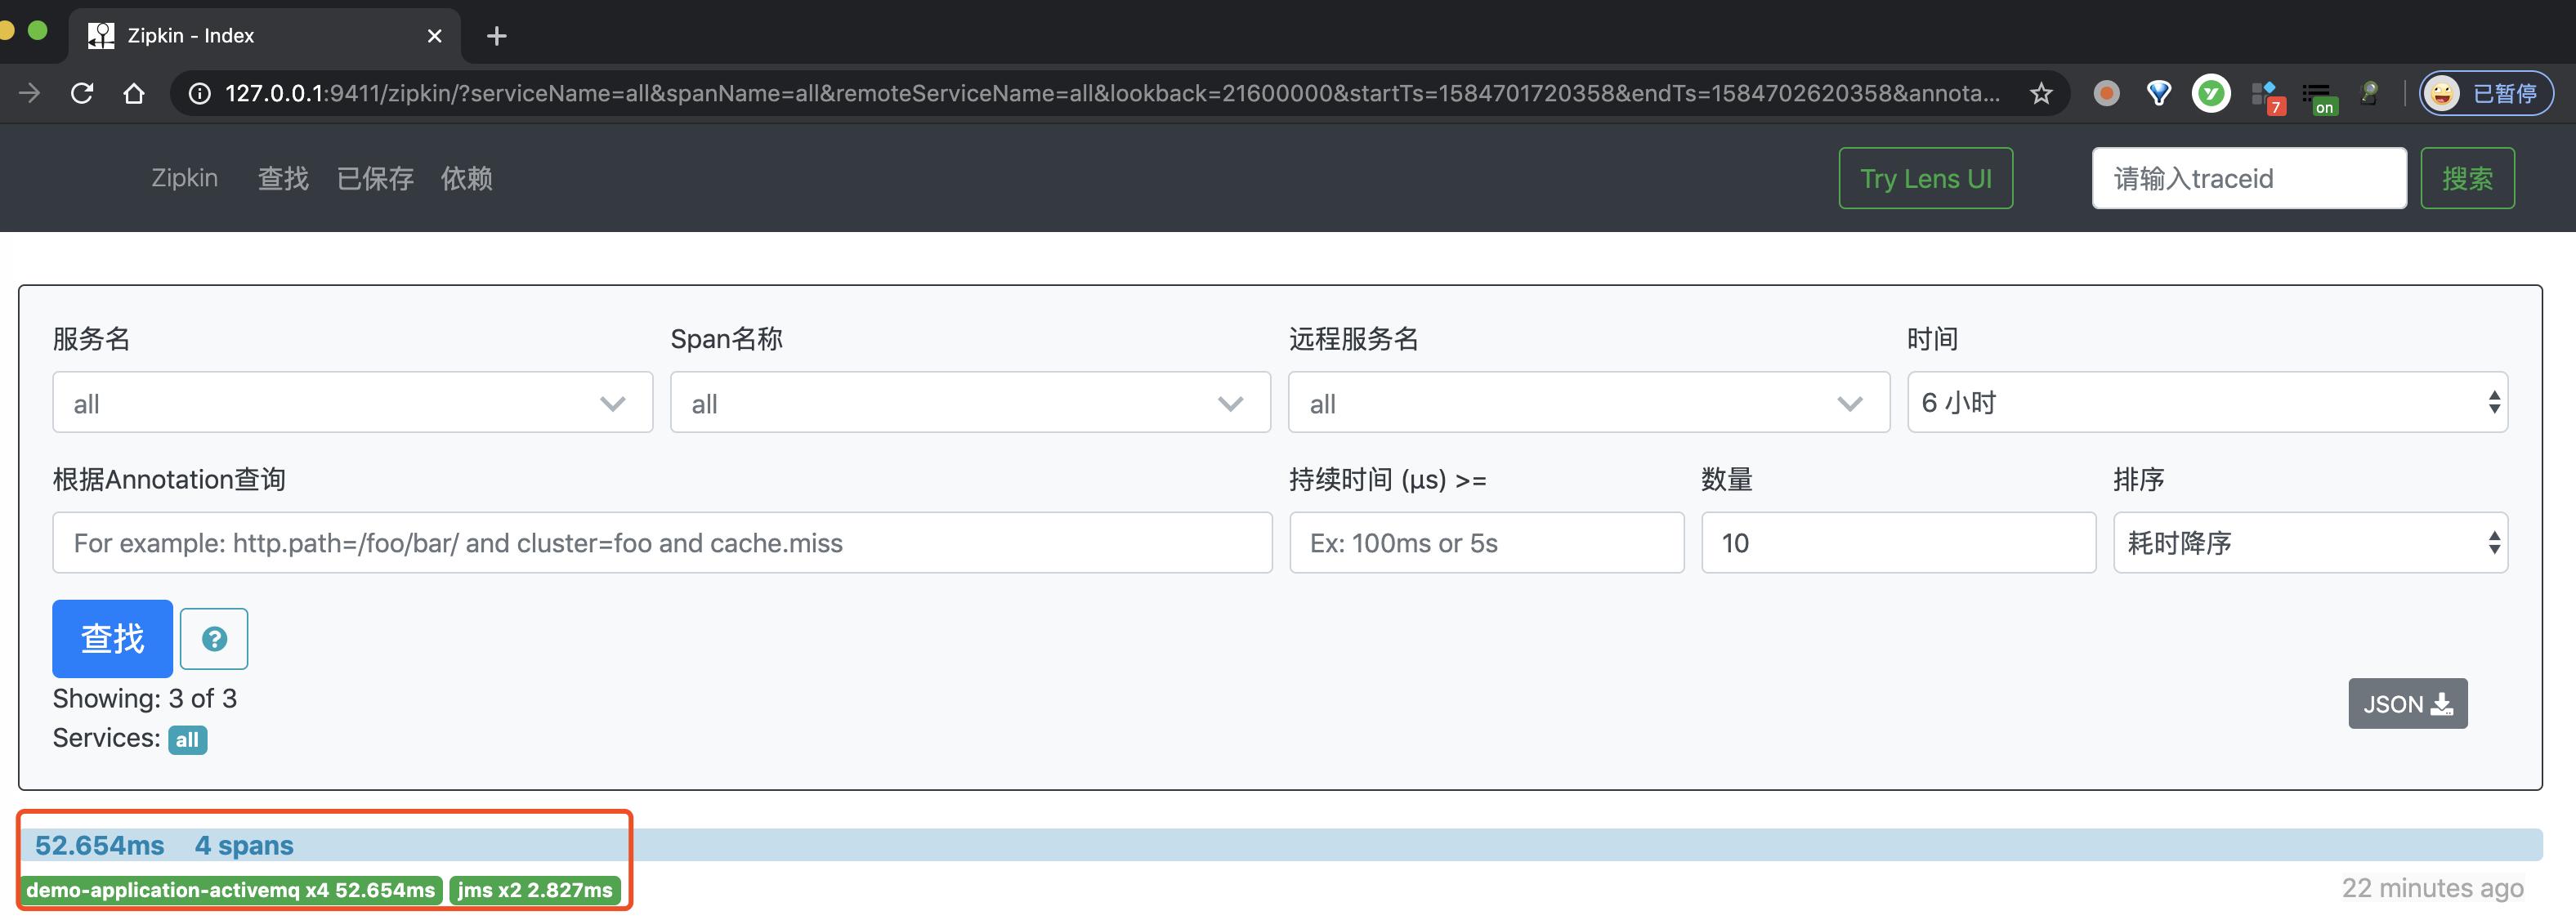 Zipkin UI —— 链路数据列表